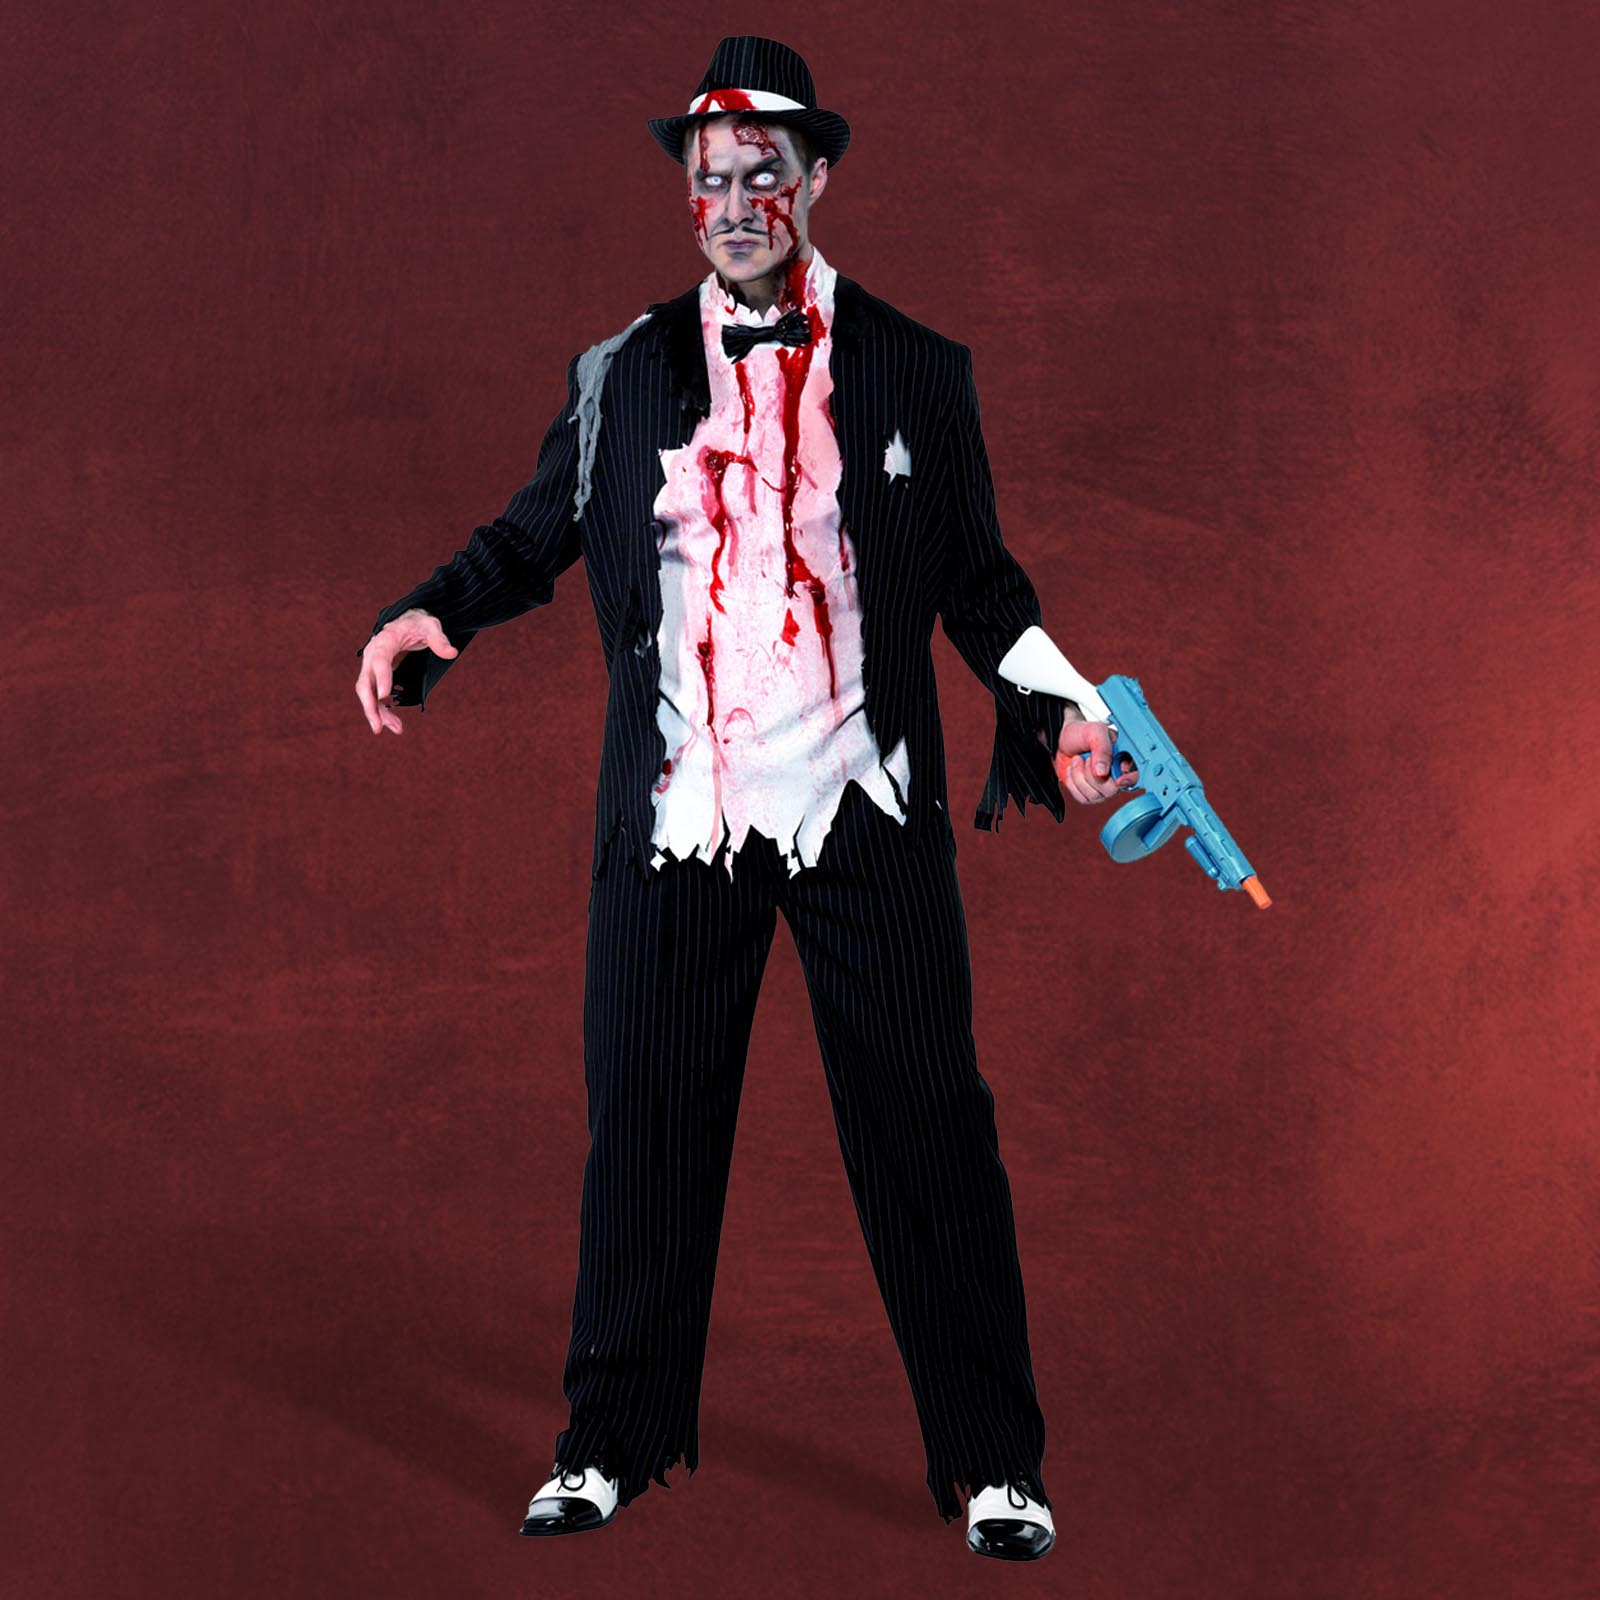 zombie gangster boss kost m halloween kost m herren 3 teilig jacke hose shirt ebay. Black Bedroom Furniture Sets. Home Design Ideas